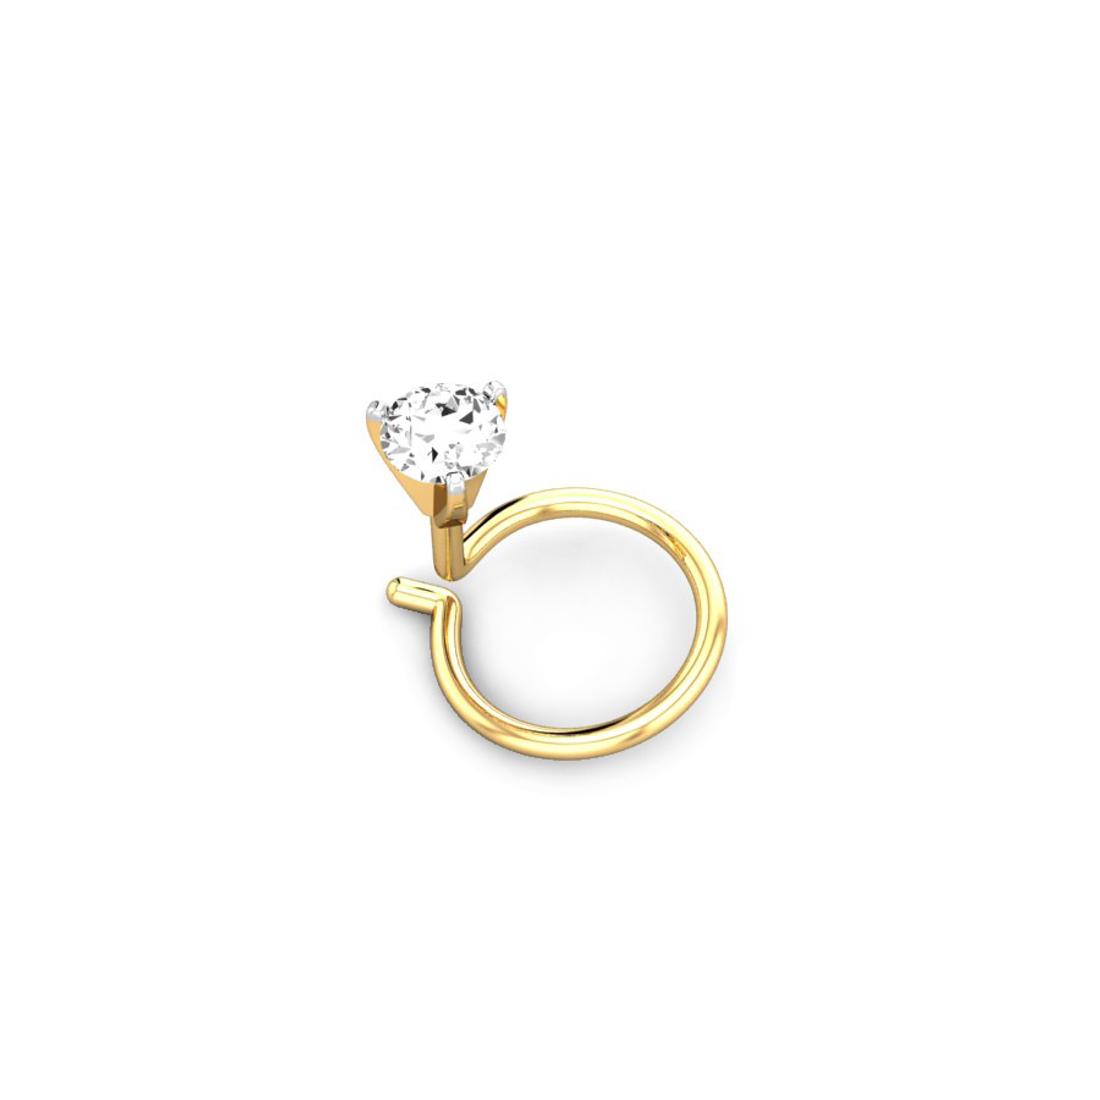 Jewel samarth 18k(750)Yellow Gold and 0.07 ct.(IGI Certified Diamonds) Nose pin